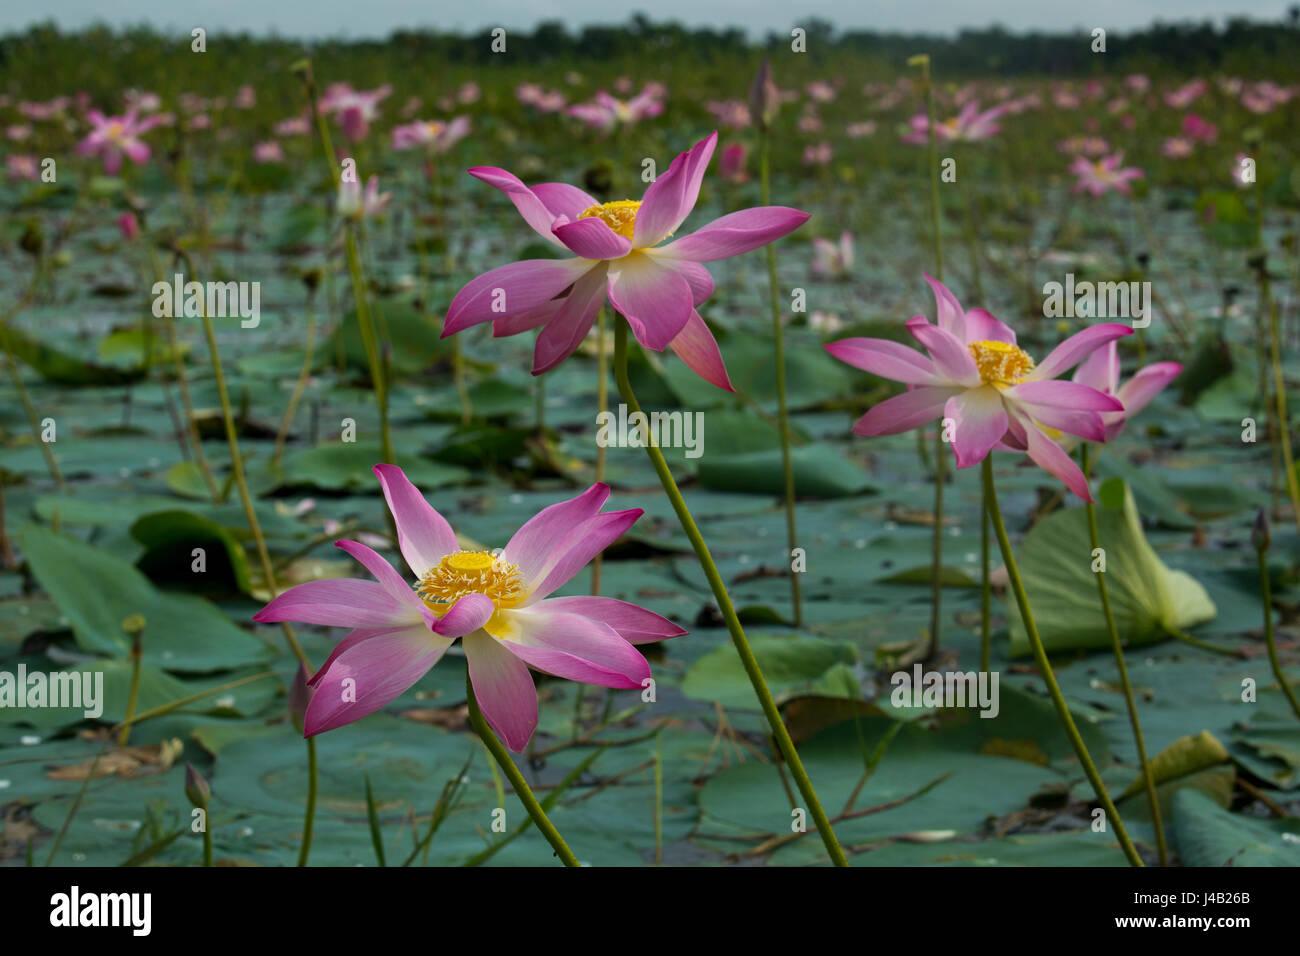 Podmo Phul Stock Photos & Podmo Phul Stock Images - Alamy